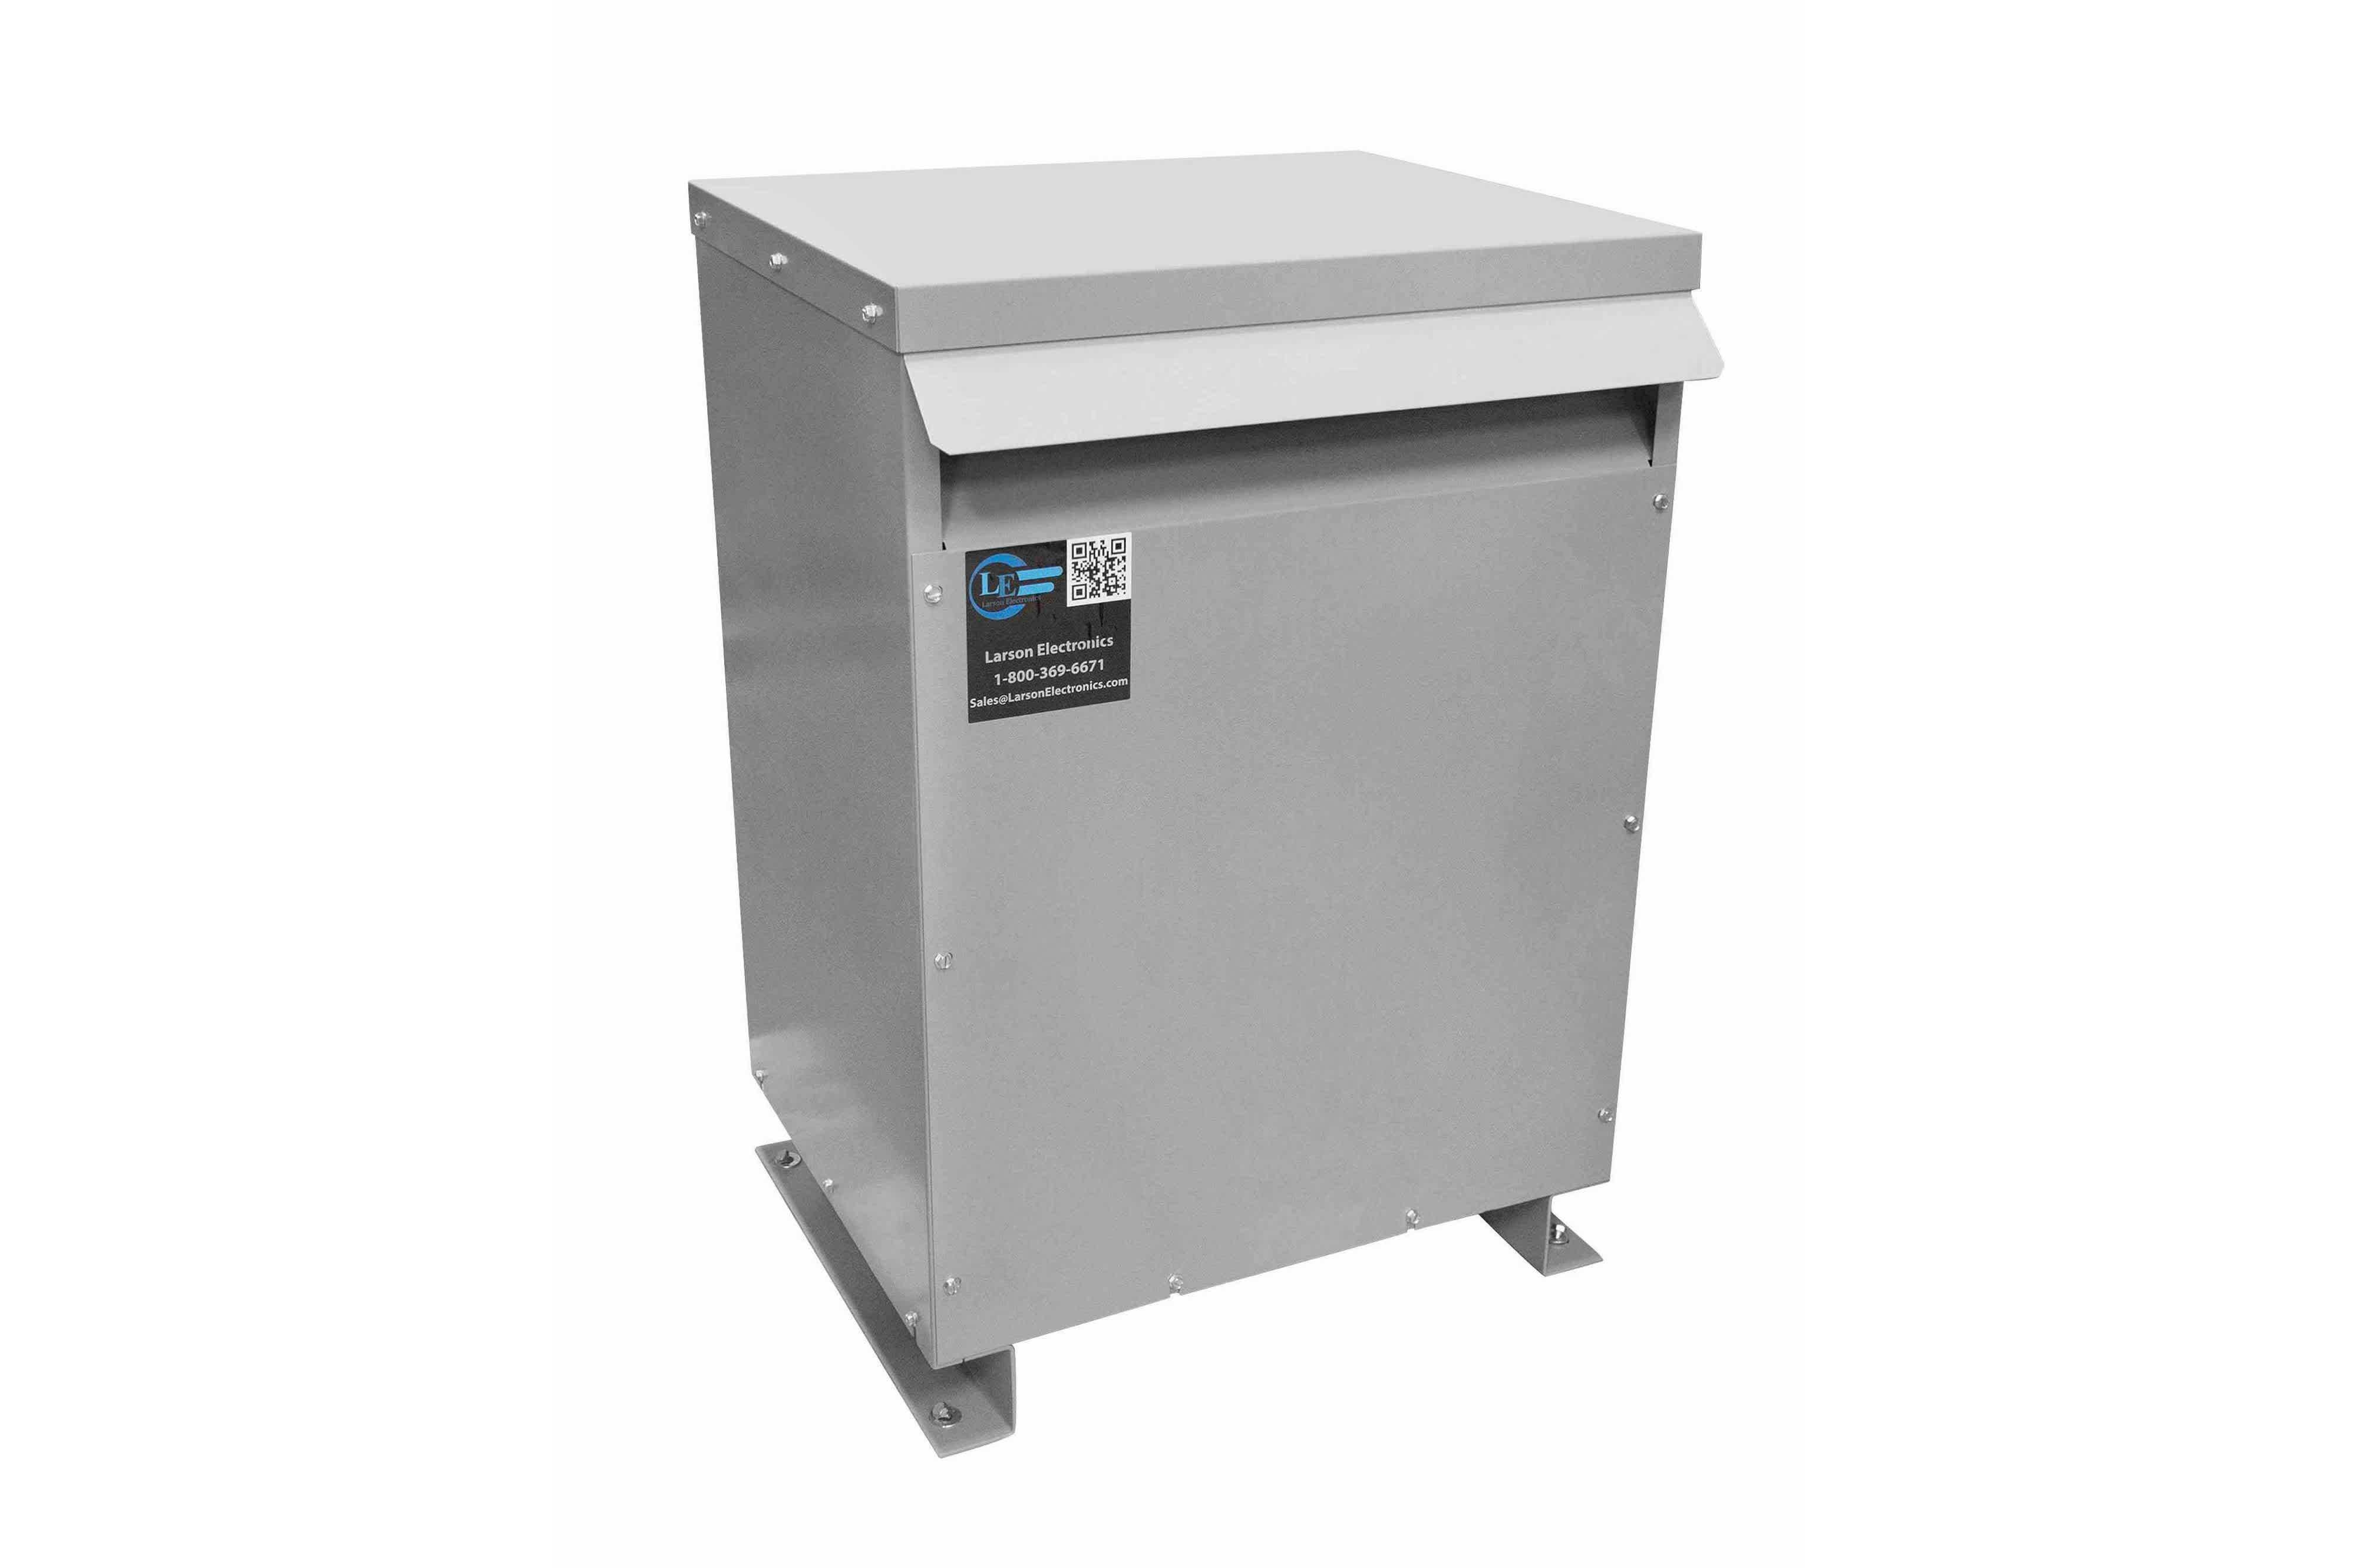 800 kVA 3PH Isolation Transformer, 460V Wye Primary, 208V Delta Secondary, N3R, Ventilated, 60 Hz